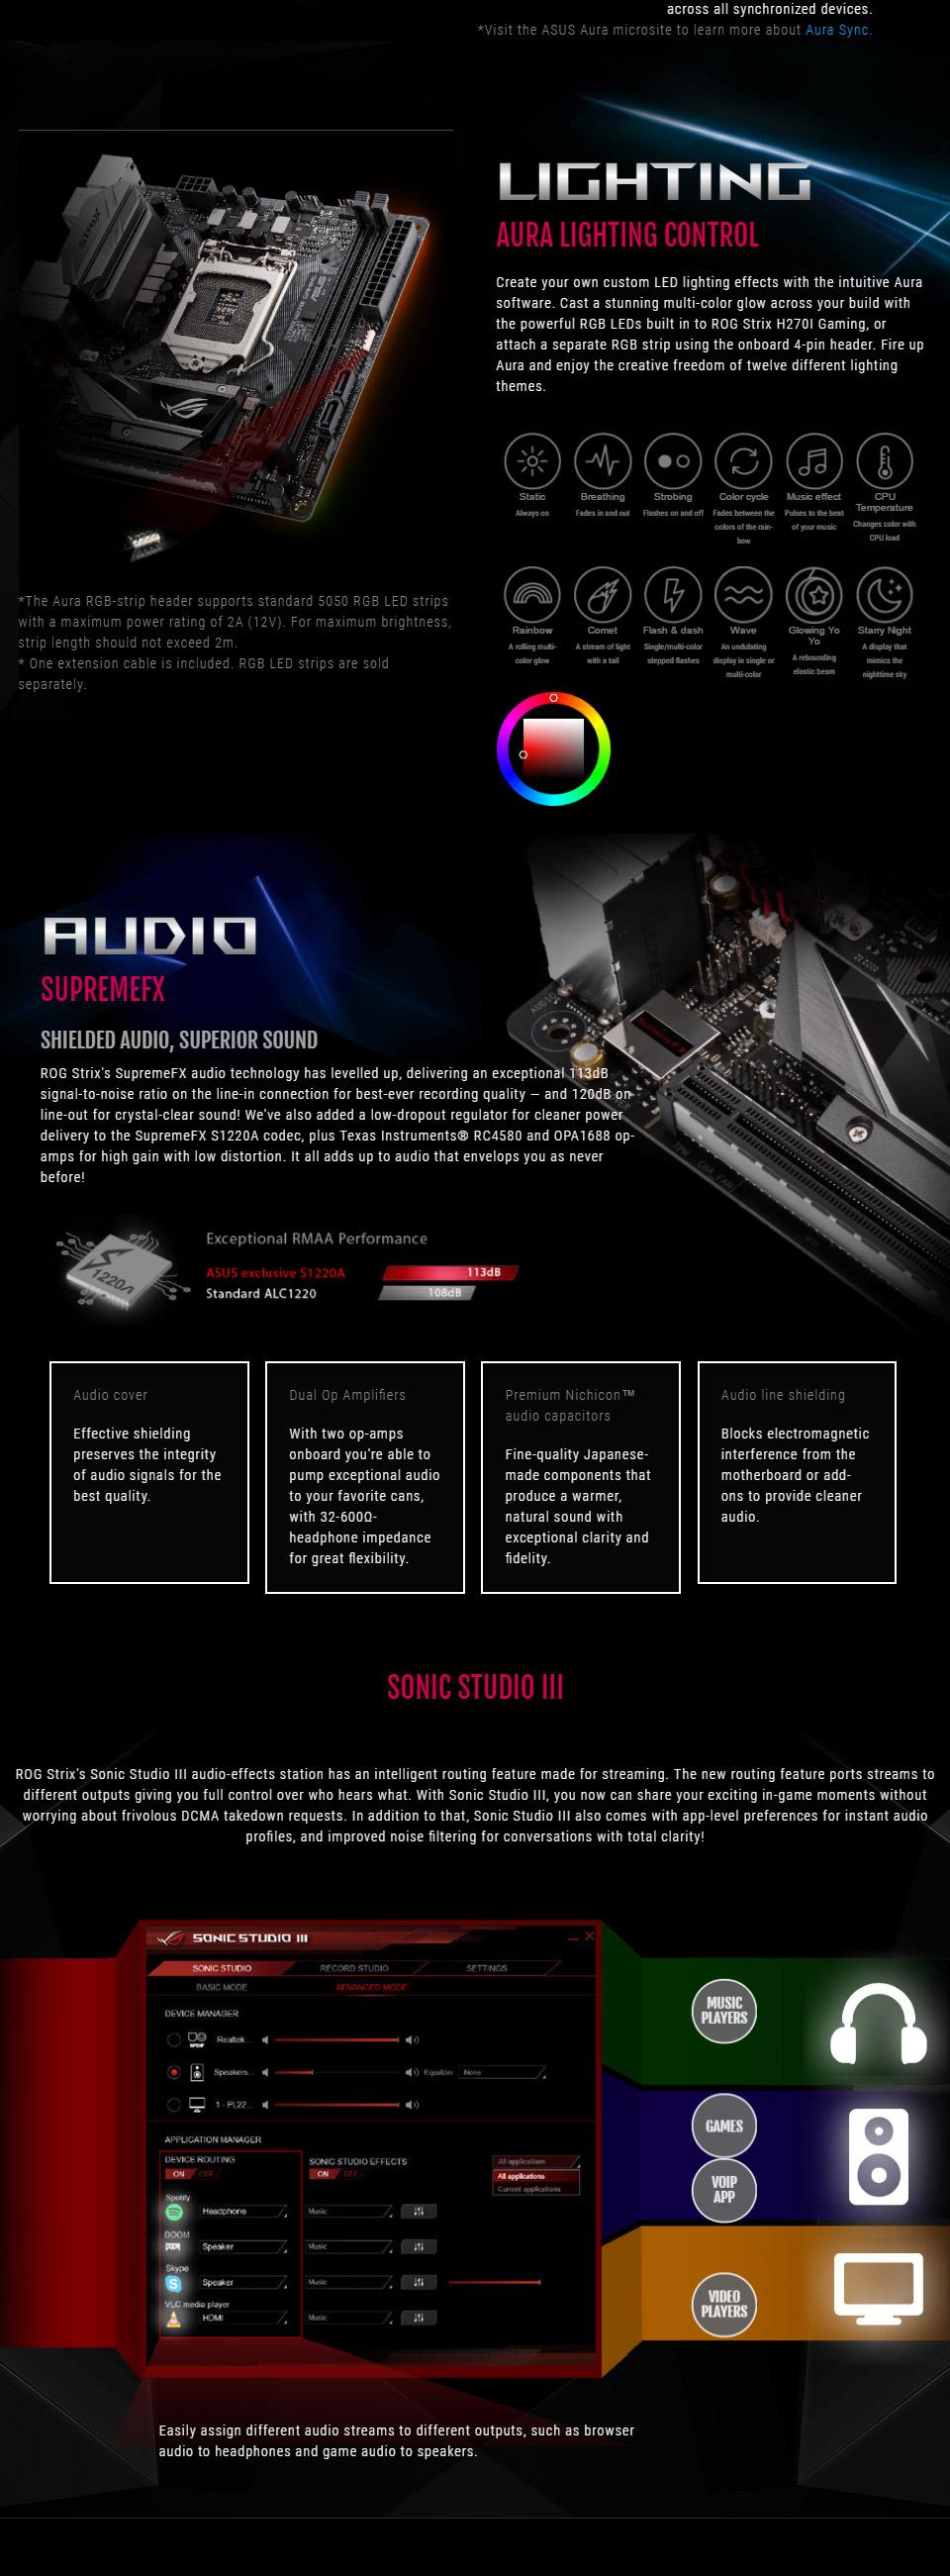 ASUS ROG Strix H270I Gaming ITX Motherboard [ROG-STRIX-H270I-GAMING] : PC Case Gear